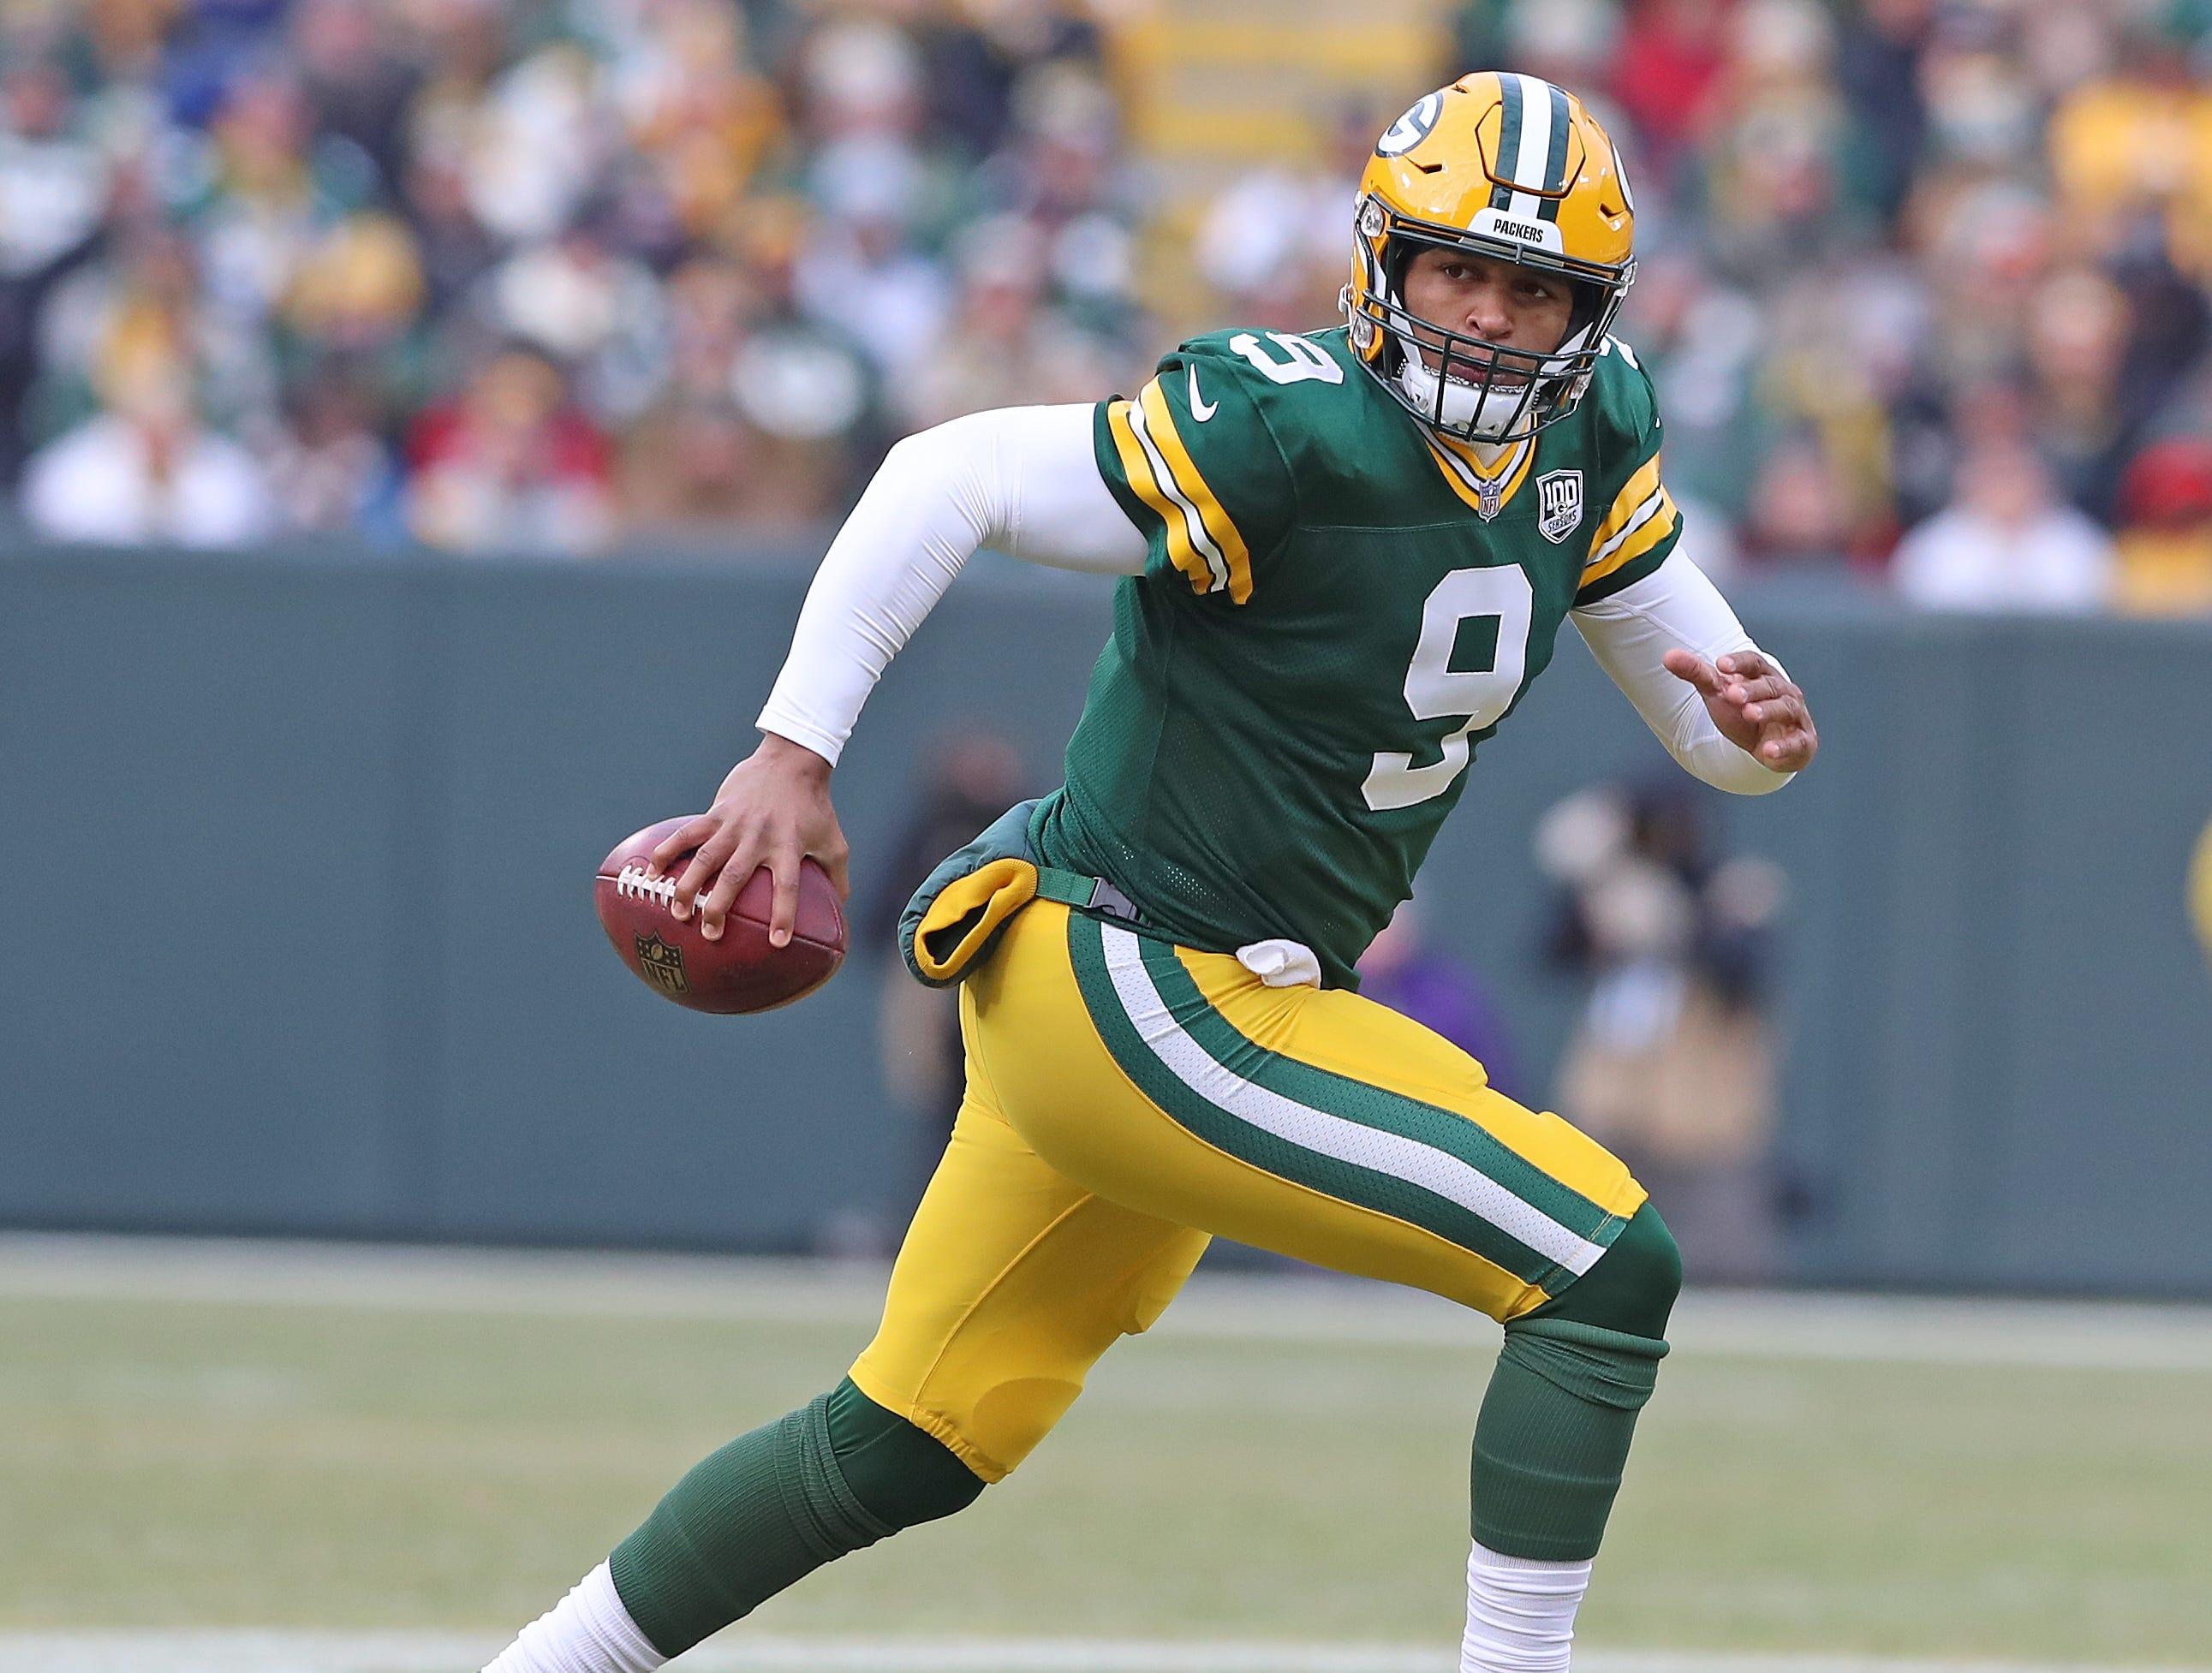 Green Bay Packers quarterback DeShone Kizer (9) scrambles against the Detroit Lions at Lambeau Field Sunday, December 30, 2018 in Green Bay, Wis.